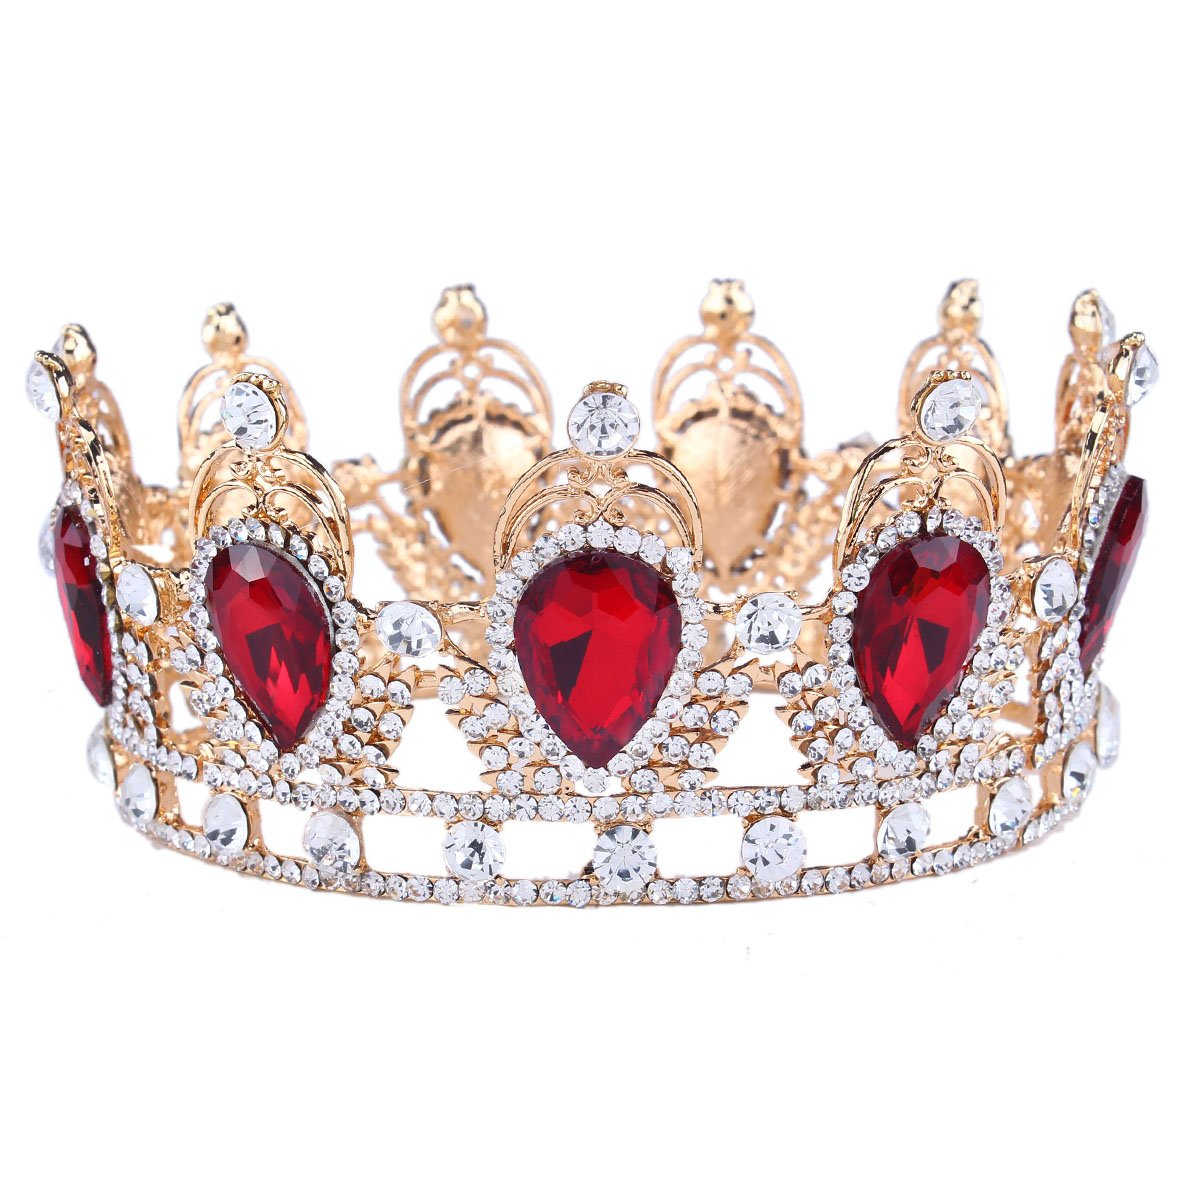 Women's Queen of Hearts Rhinestone Red Crystal Teardrop Crown - DeluxeAdultCostumes.com